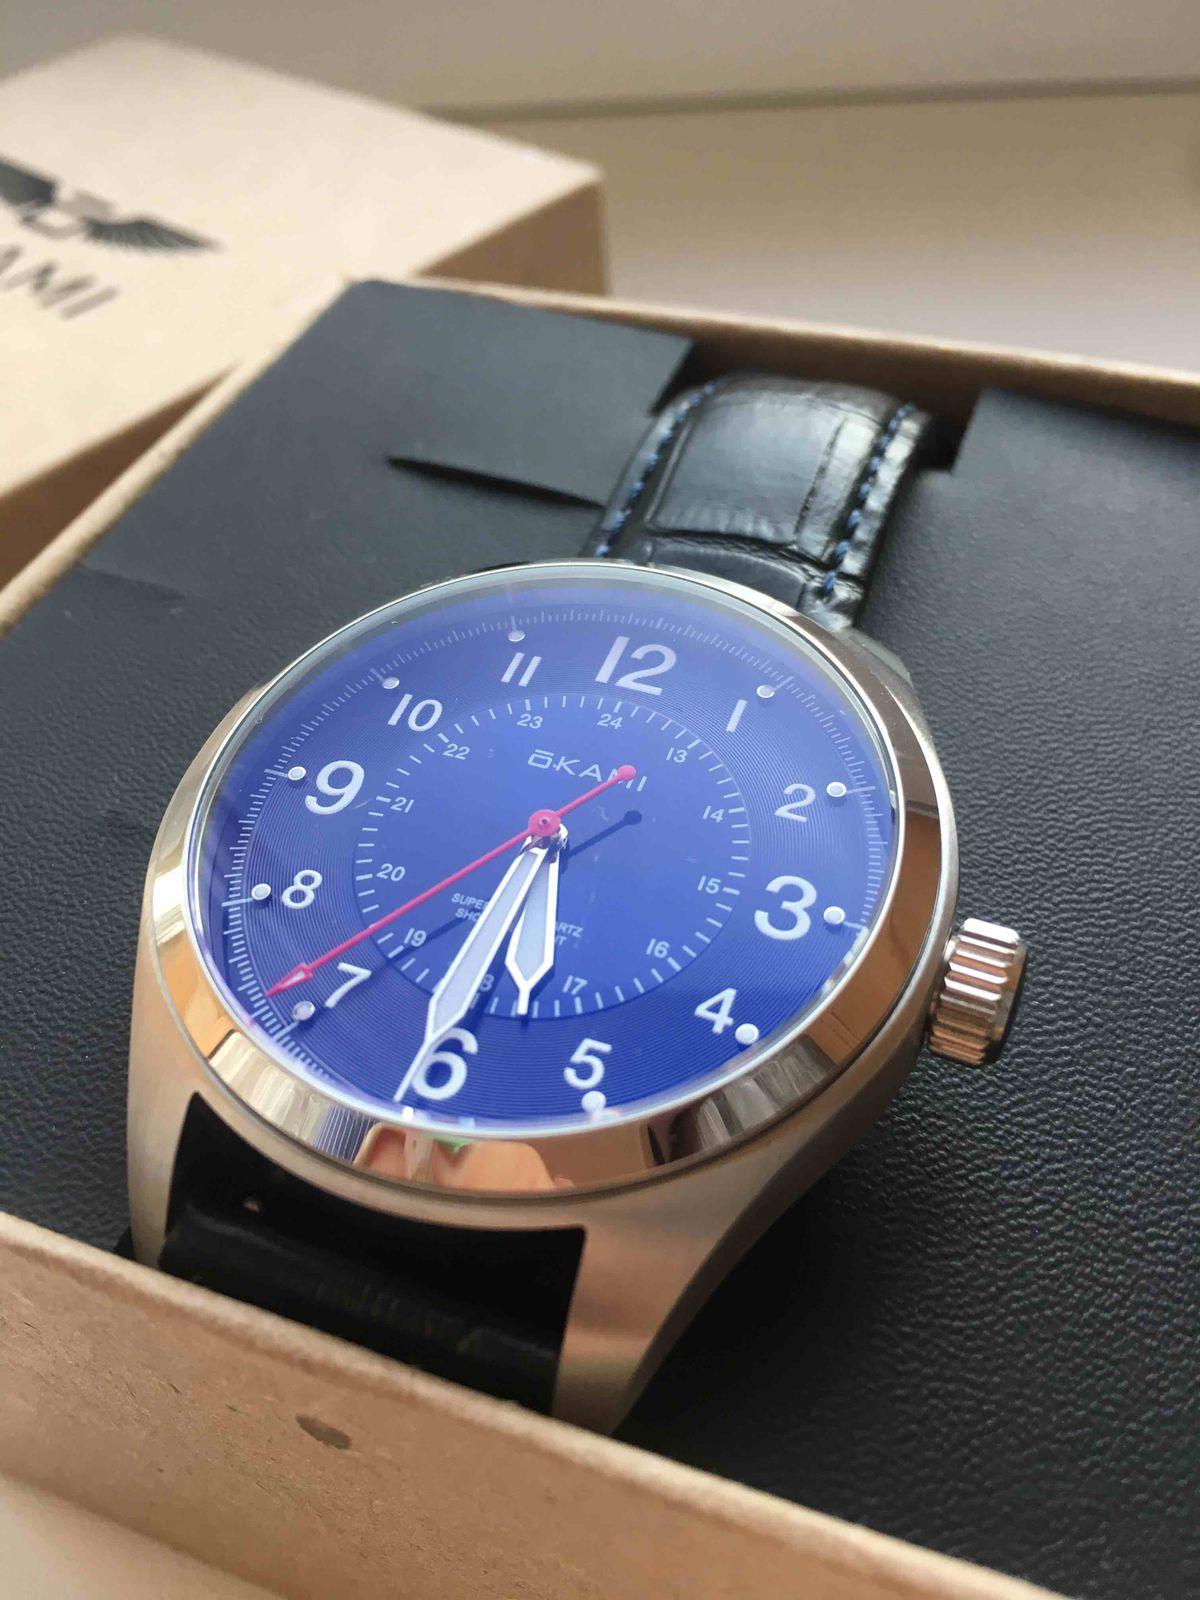 Замечательные часы!